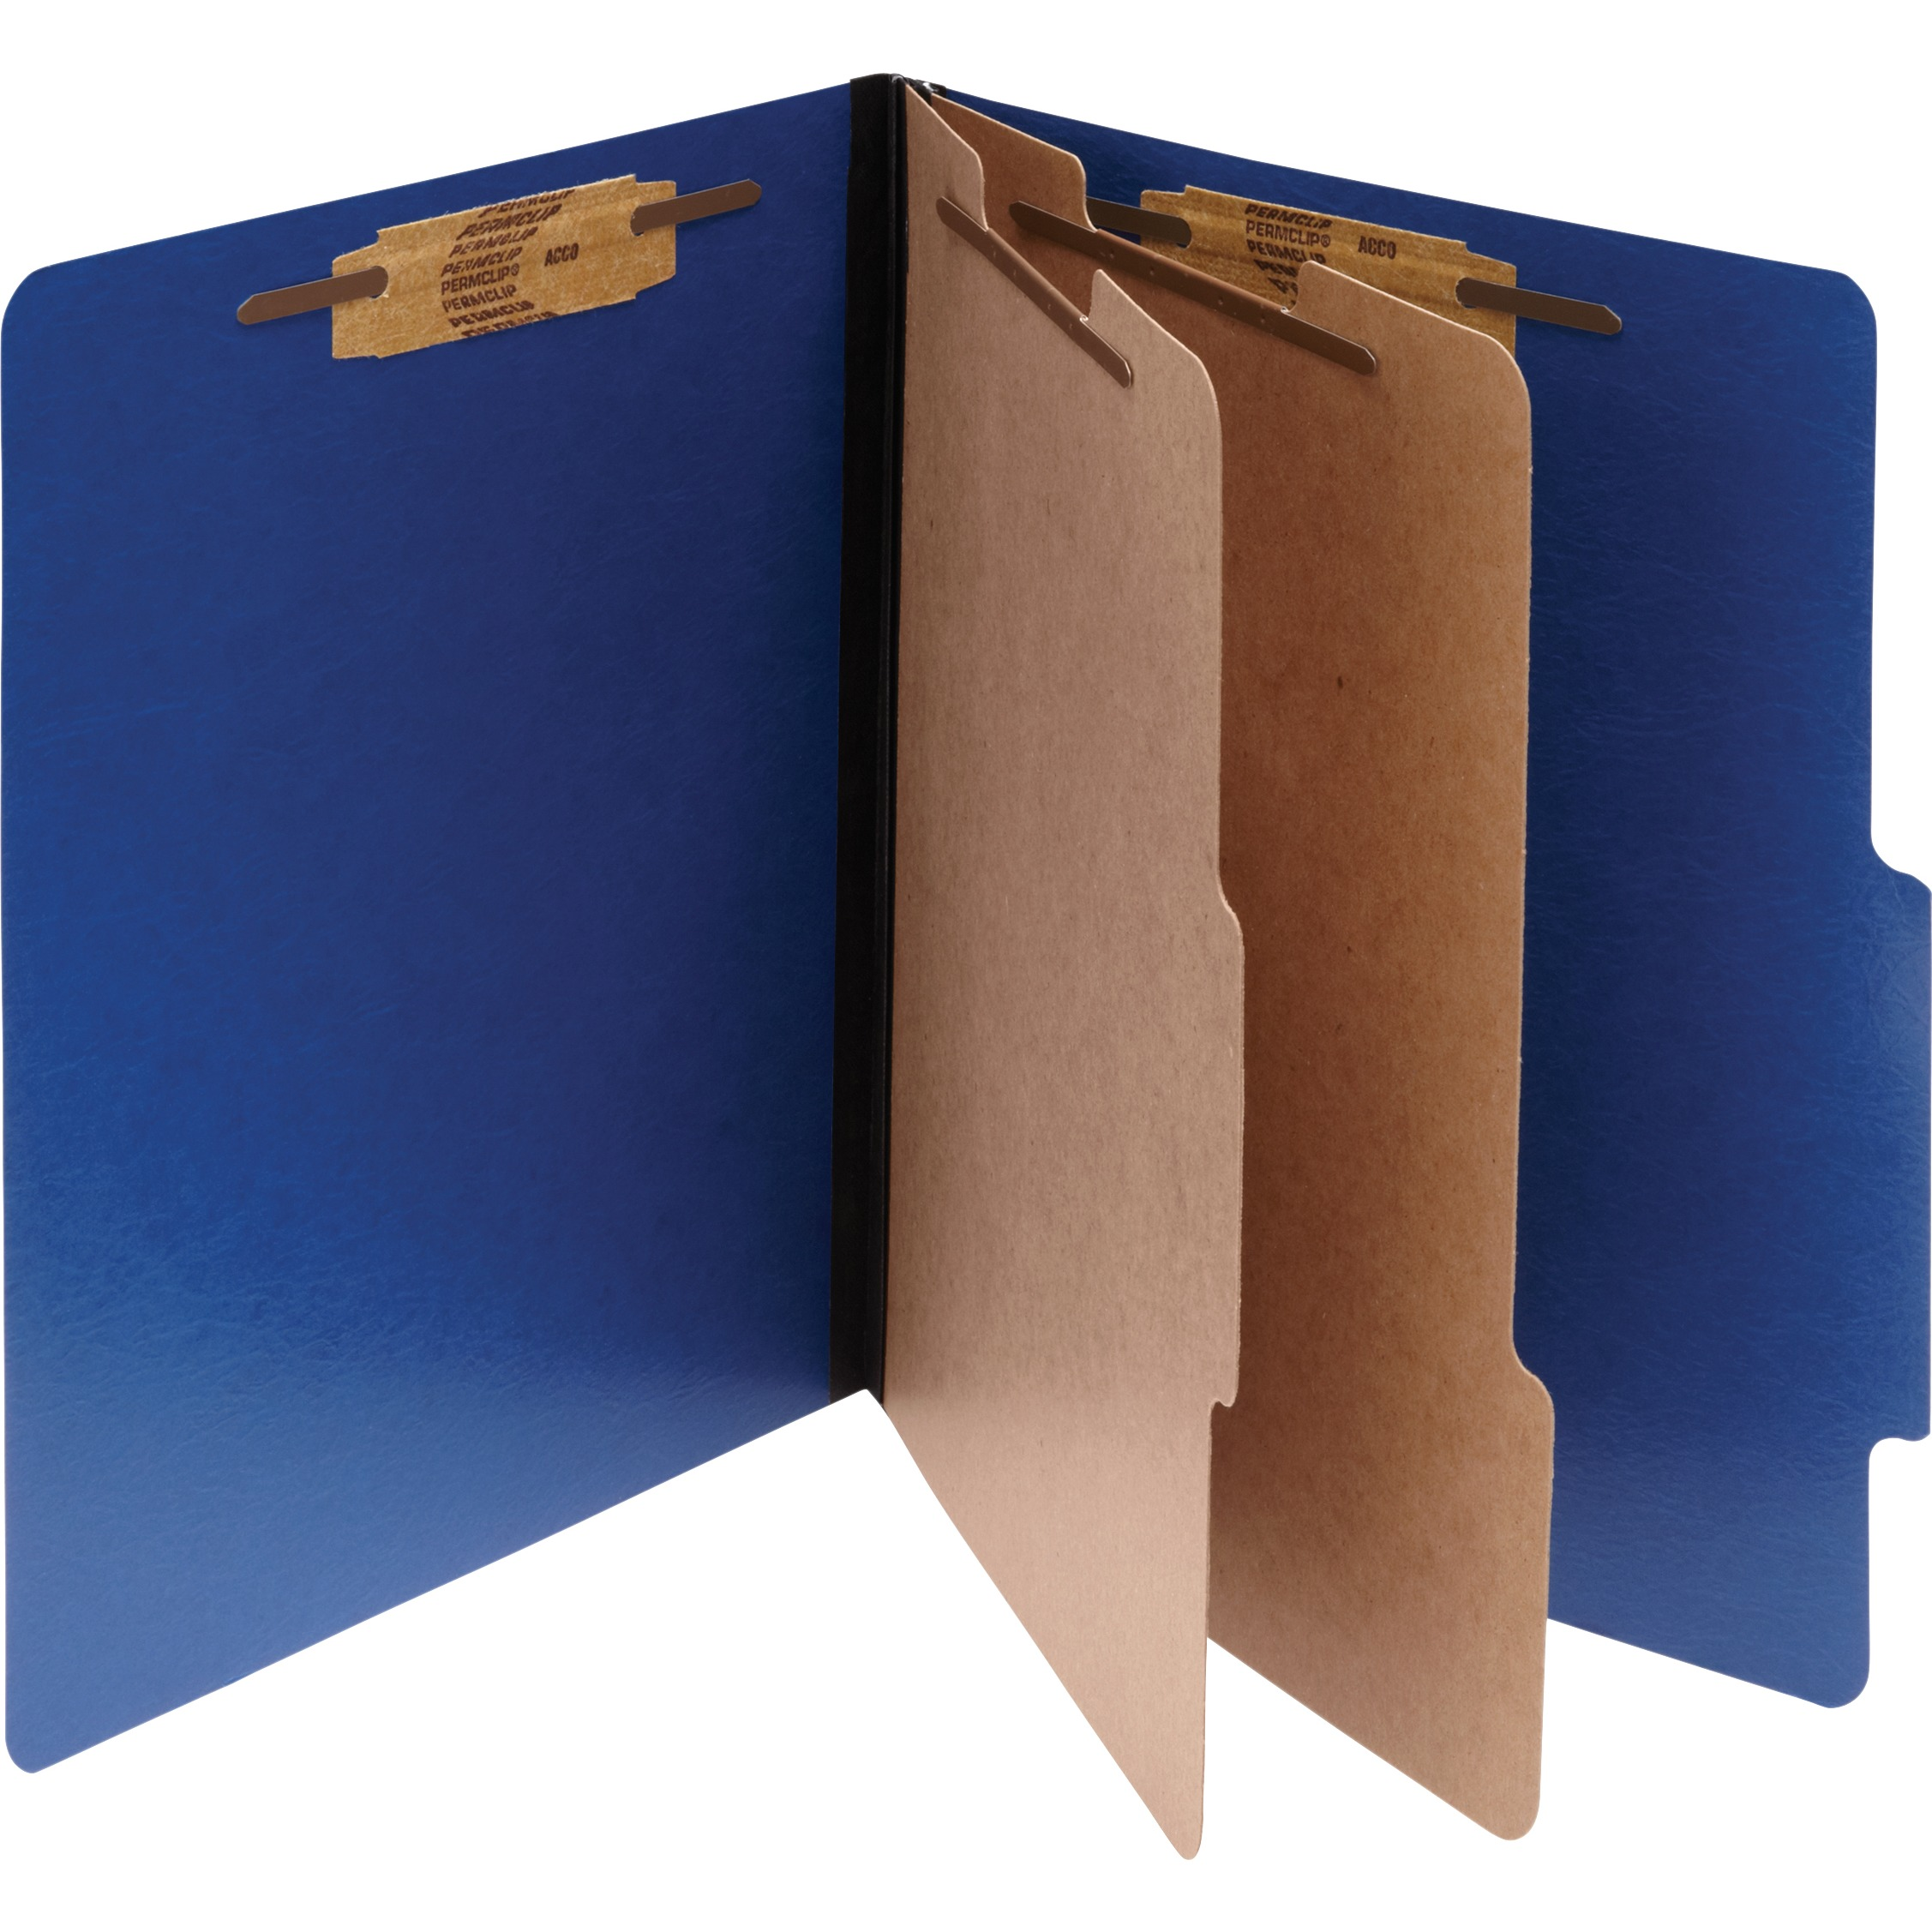 ColorLife PRESSTEX Classification Folders, Letter, 6-Section, Dark Blue, 10/Box